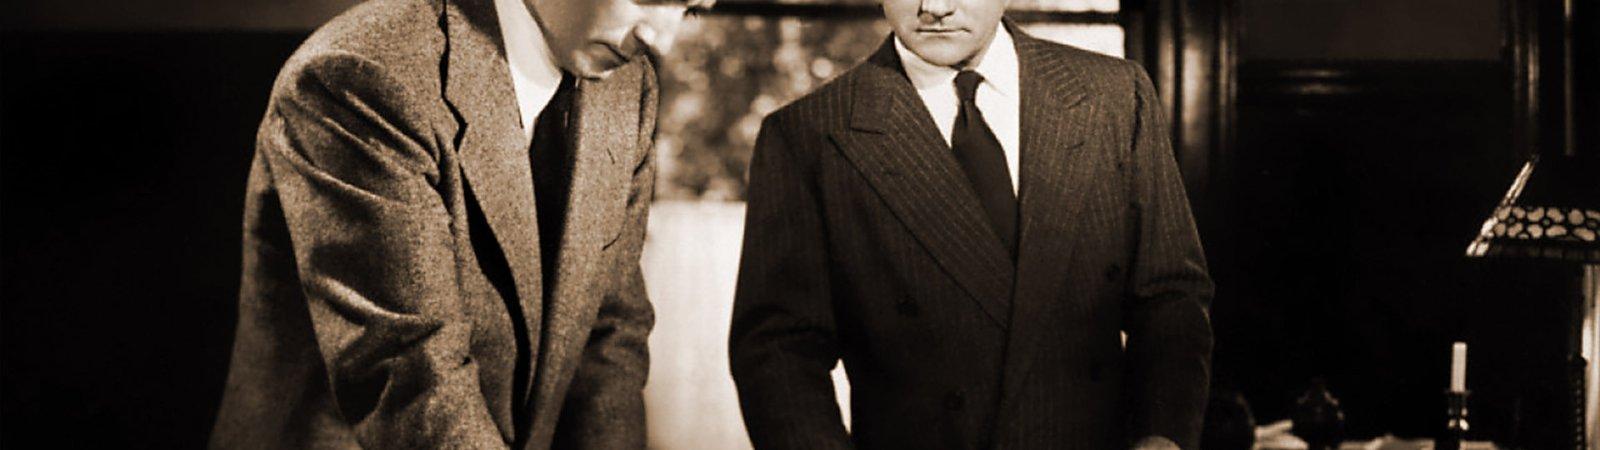 Photo dernier film  Frank Latimore